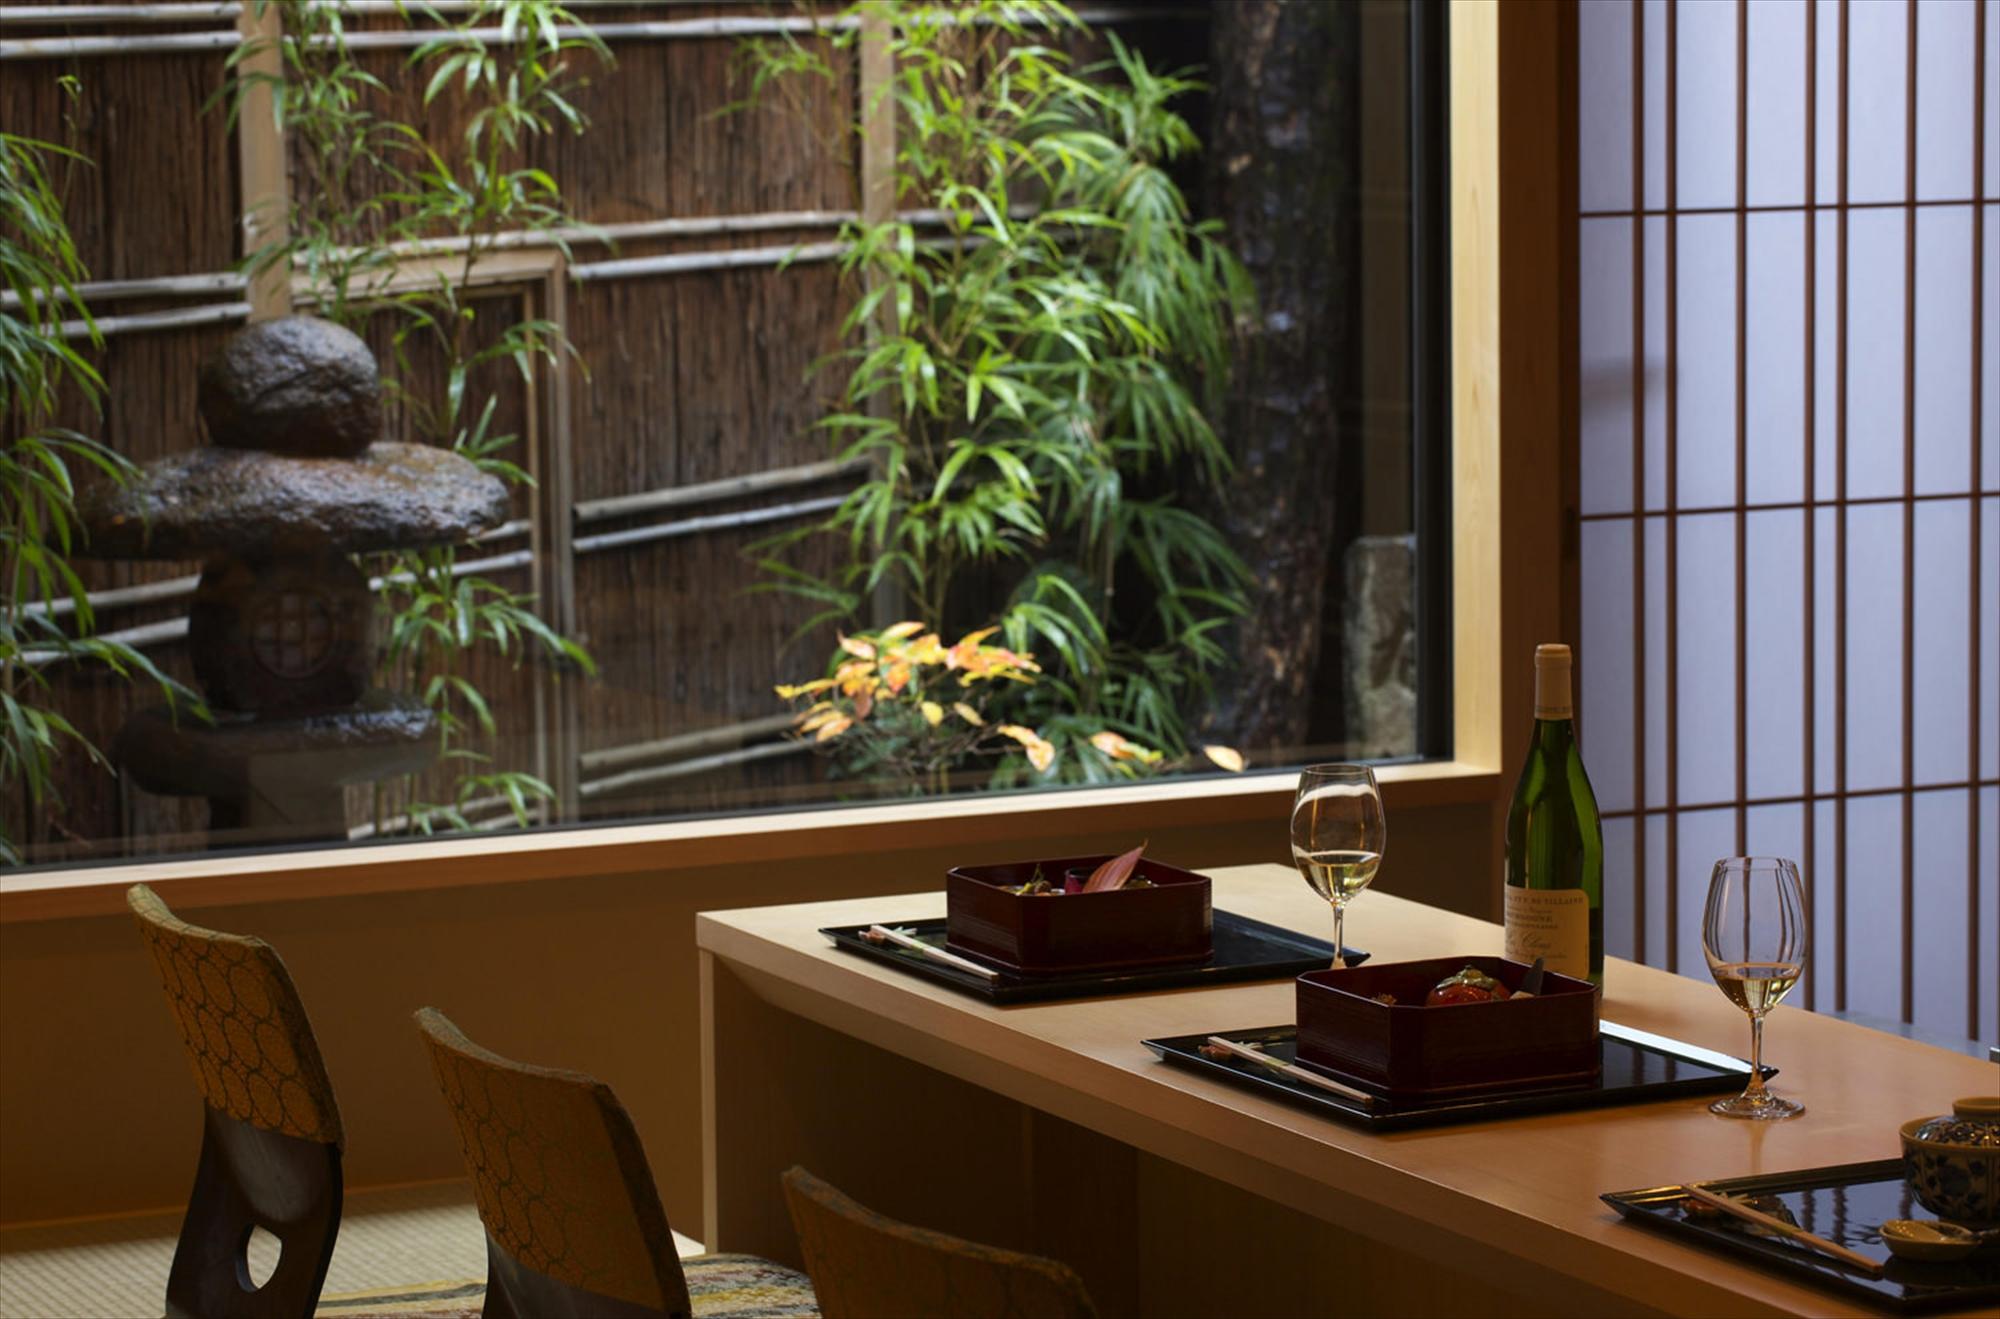 Jikishinbo Saiki interior table-set